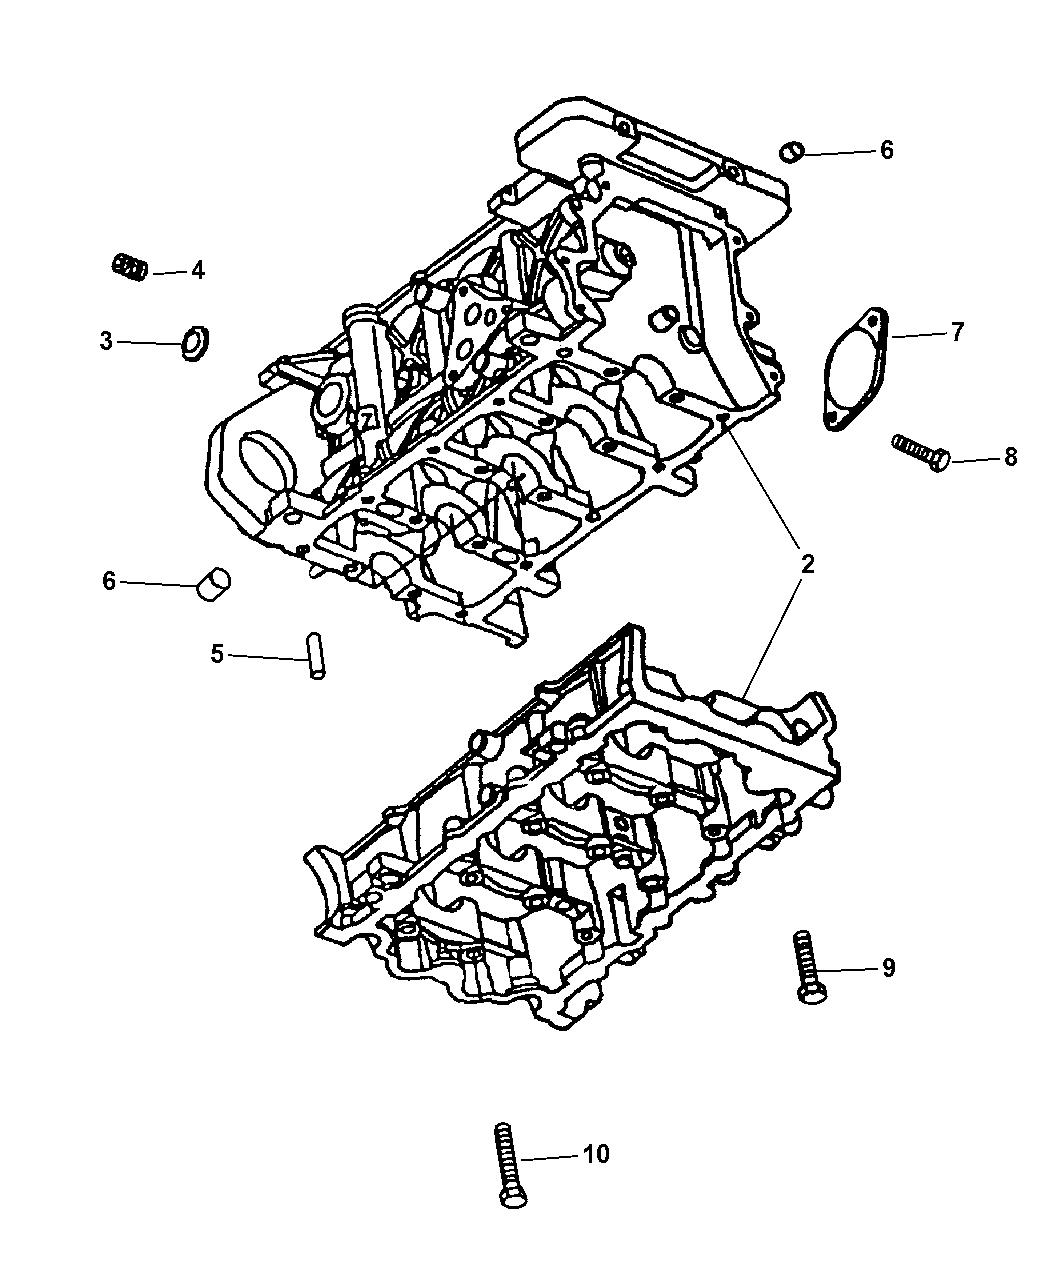 2005 Chrysler Pt Cruiser Cylinder Block Related Parts Engine Diagram Thumbnail 3